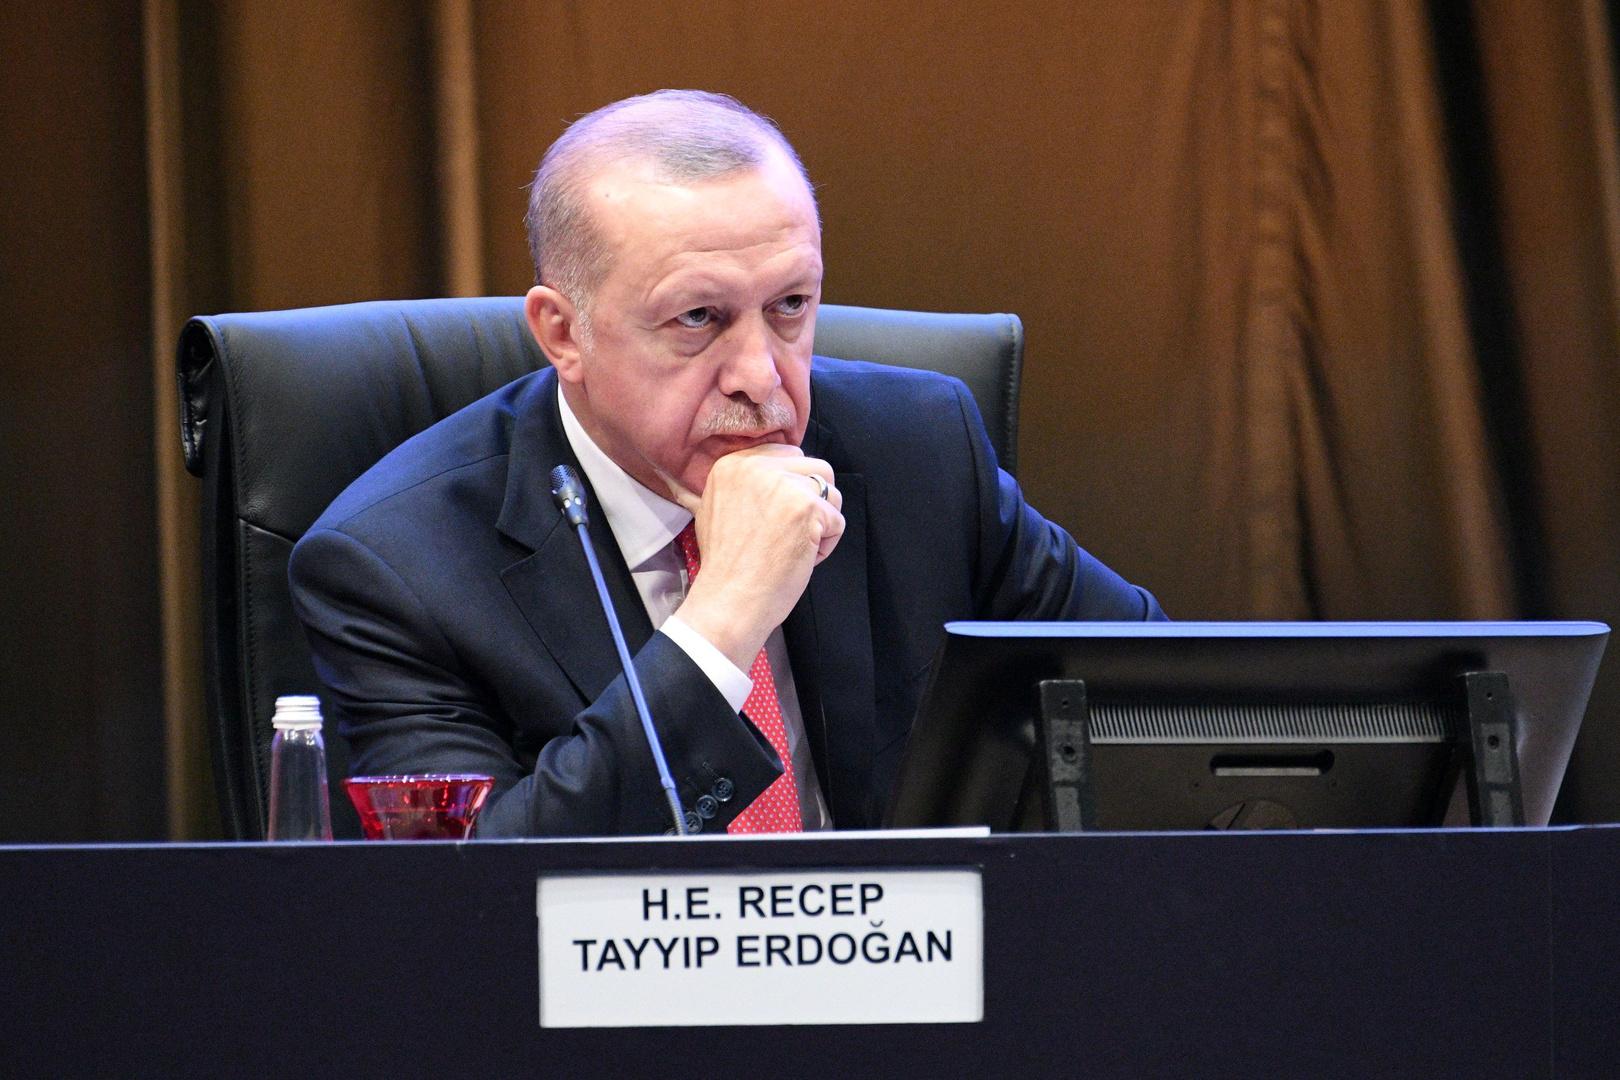 أردوغان يُعدّ حفتر مرتزقا